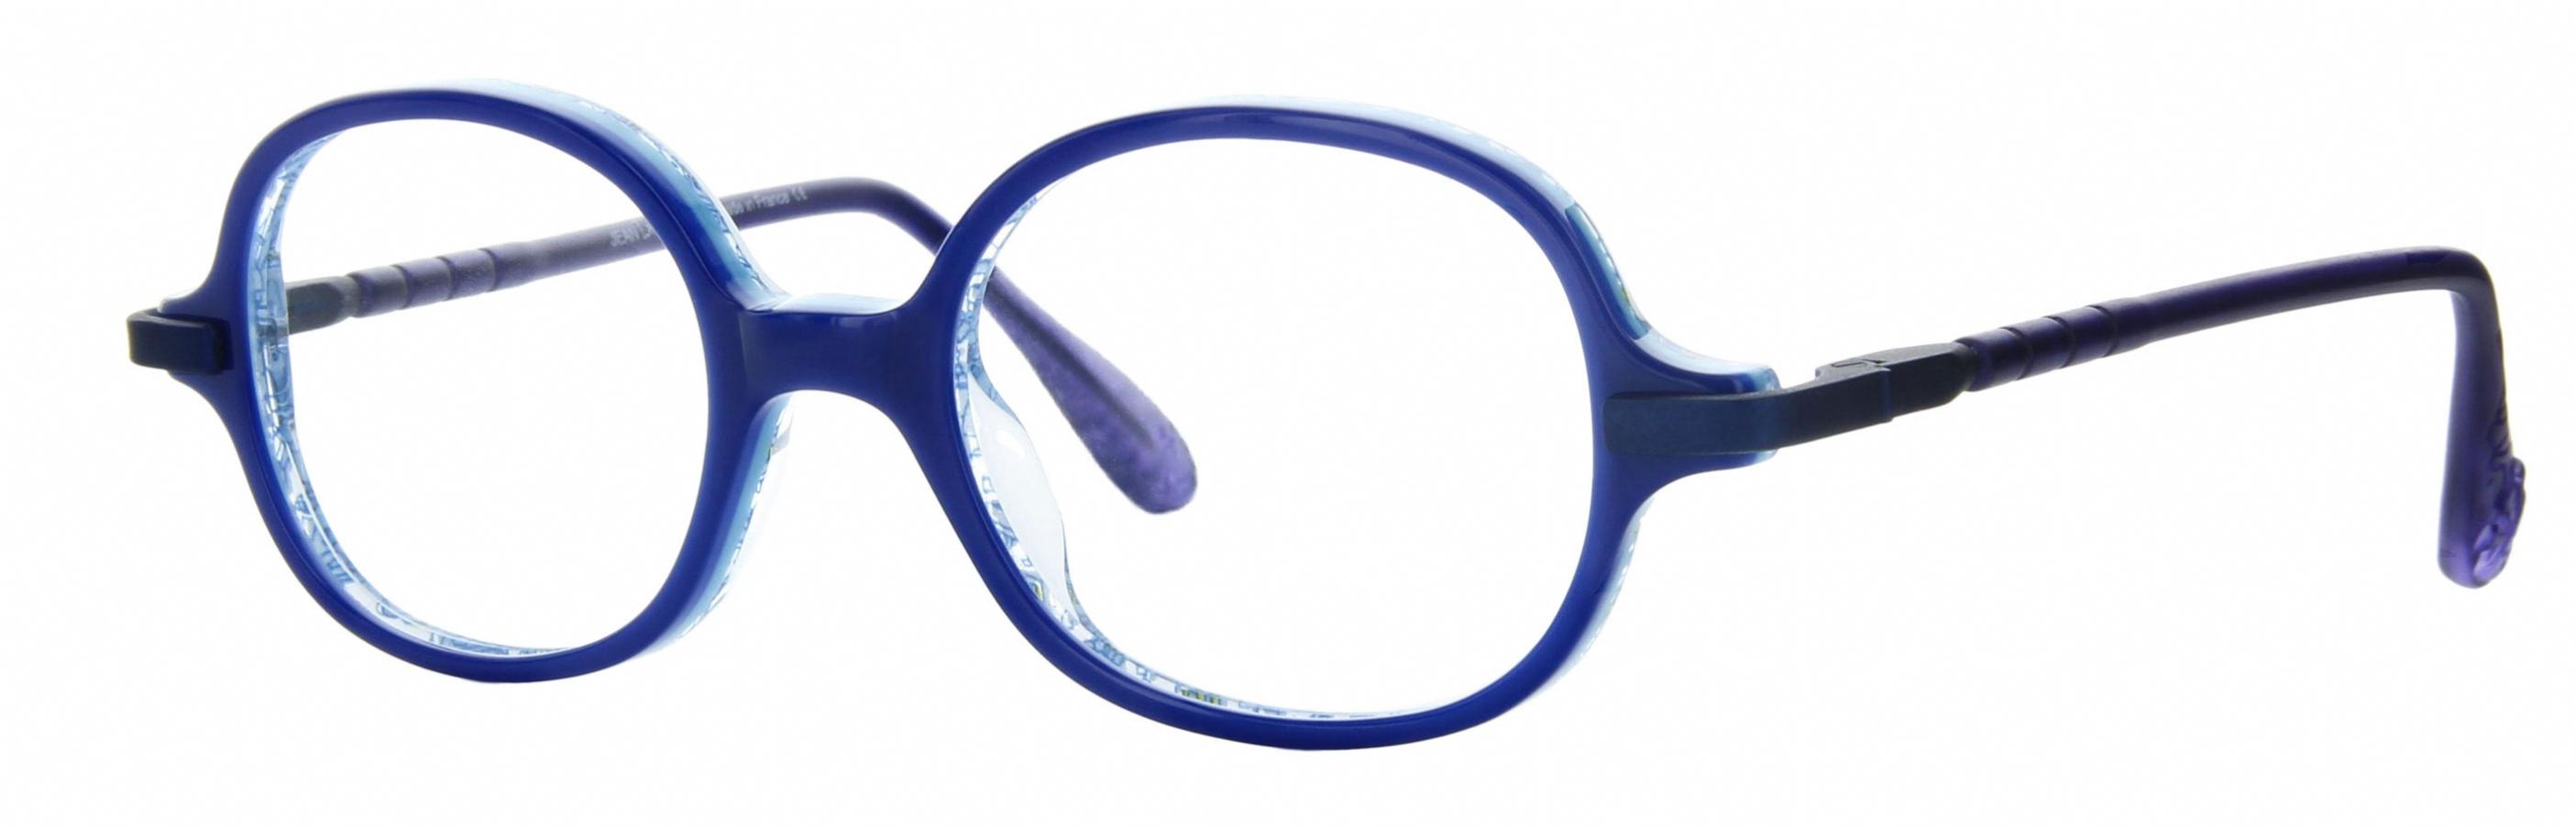 Jean lafont eyeglasses frames - Lafont